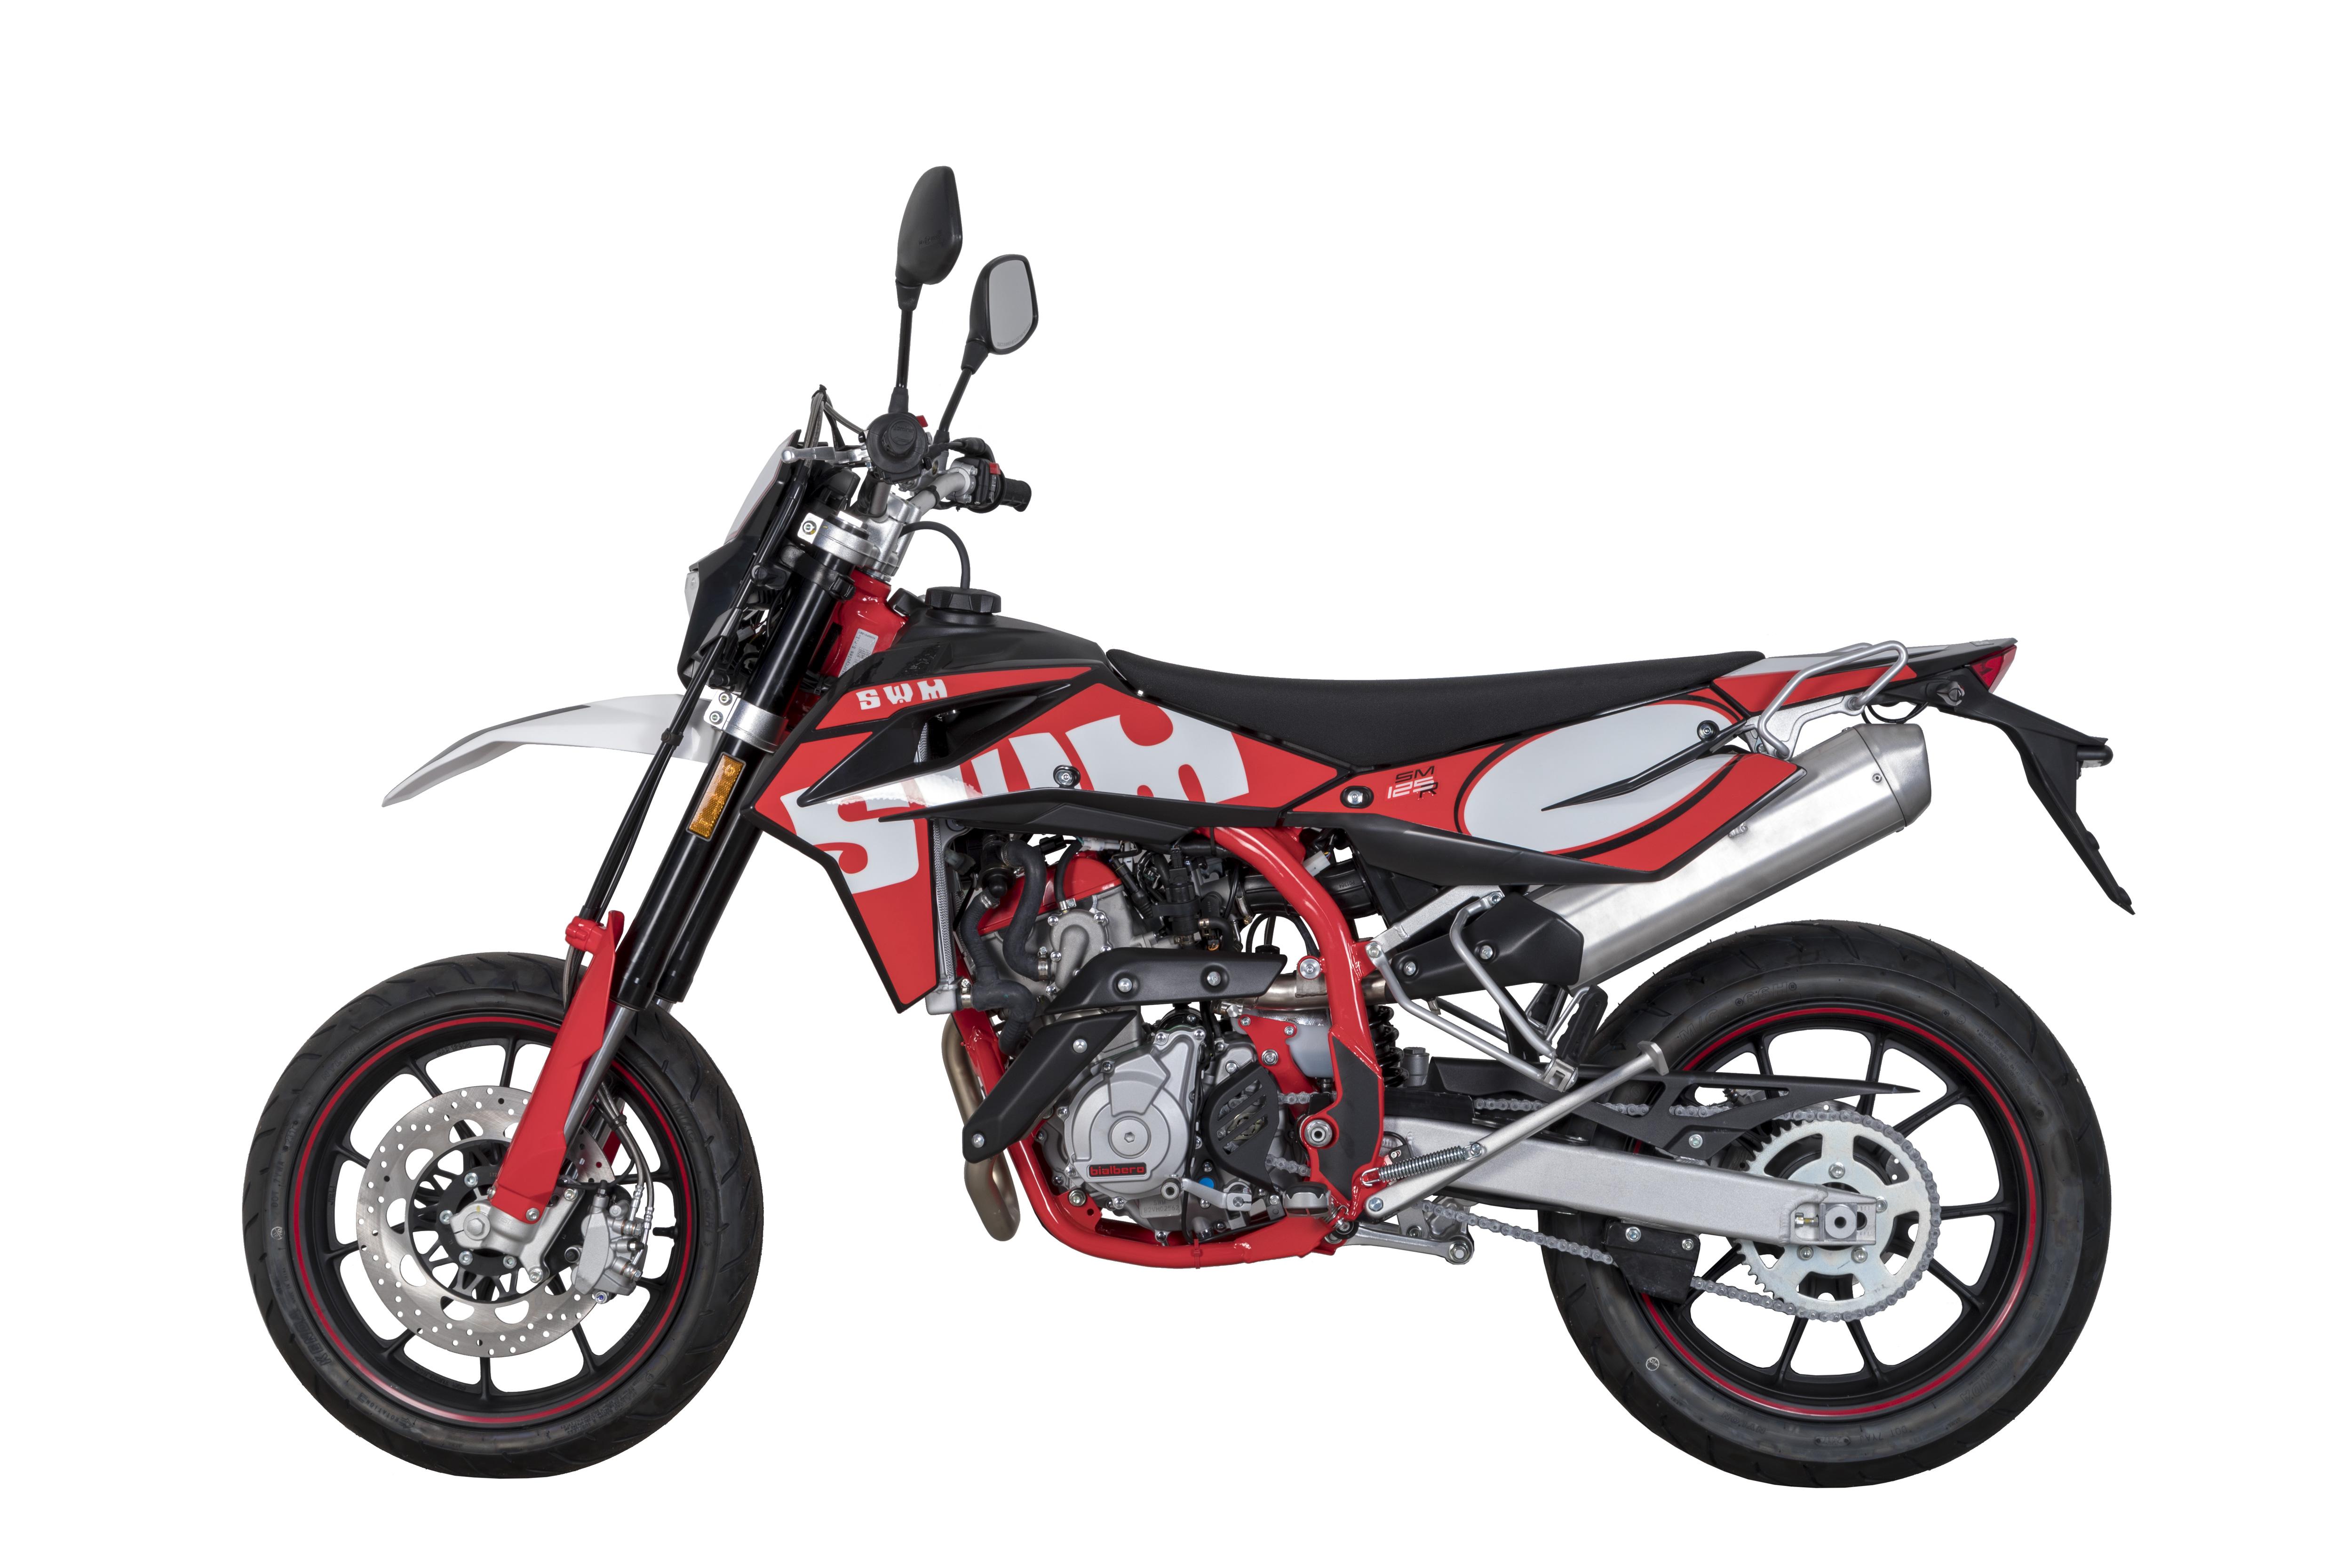 Sm 125 R Factory Swm Motorcycles